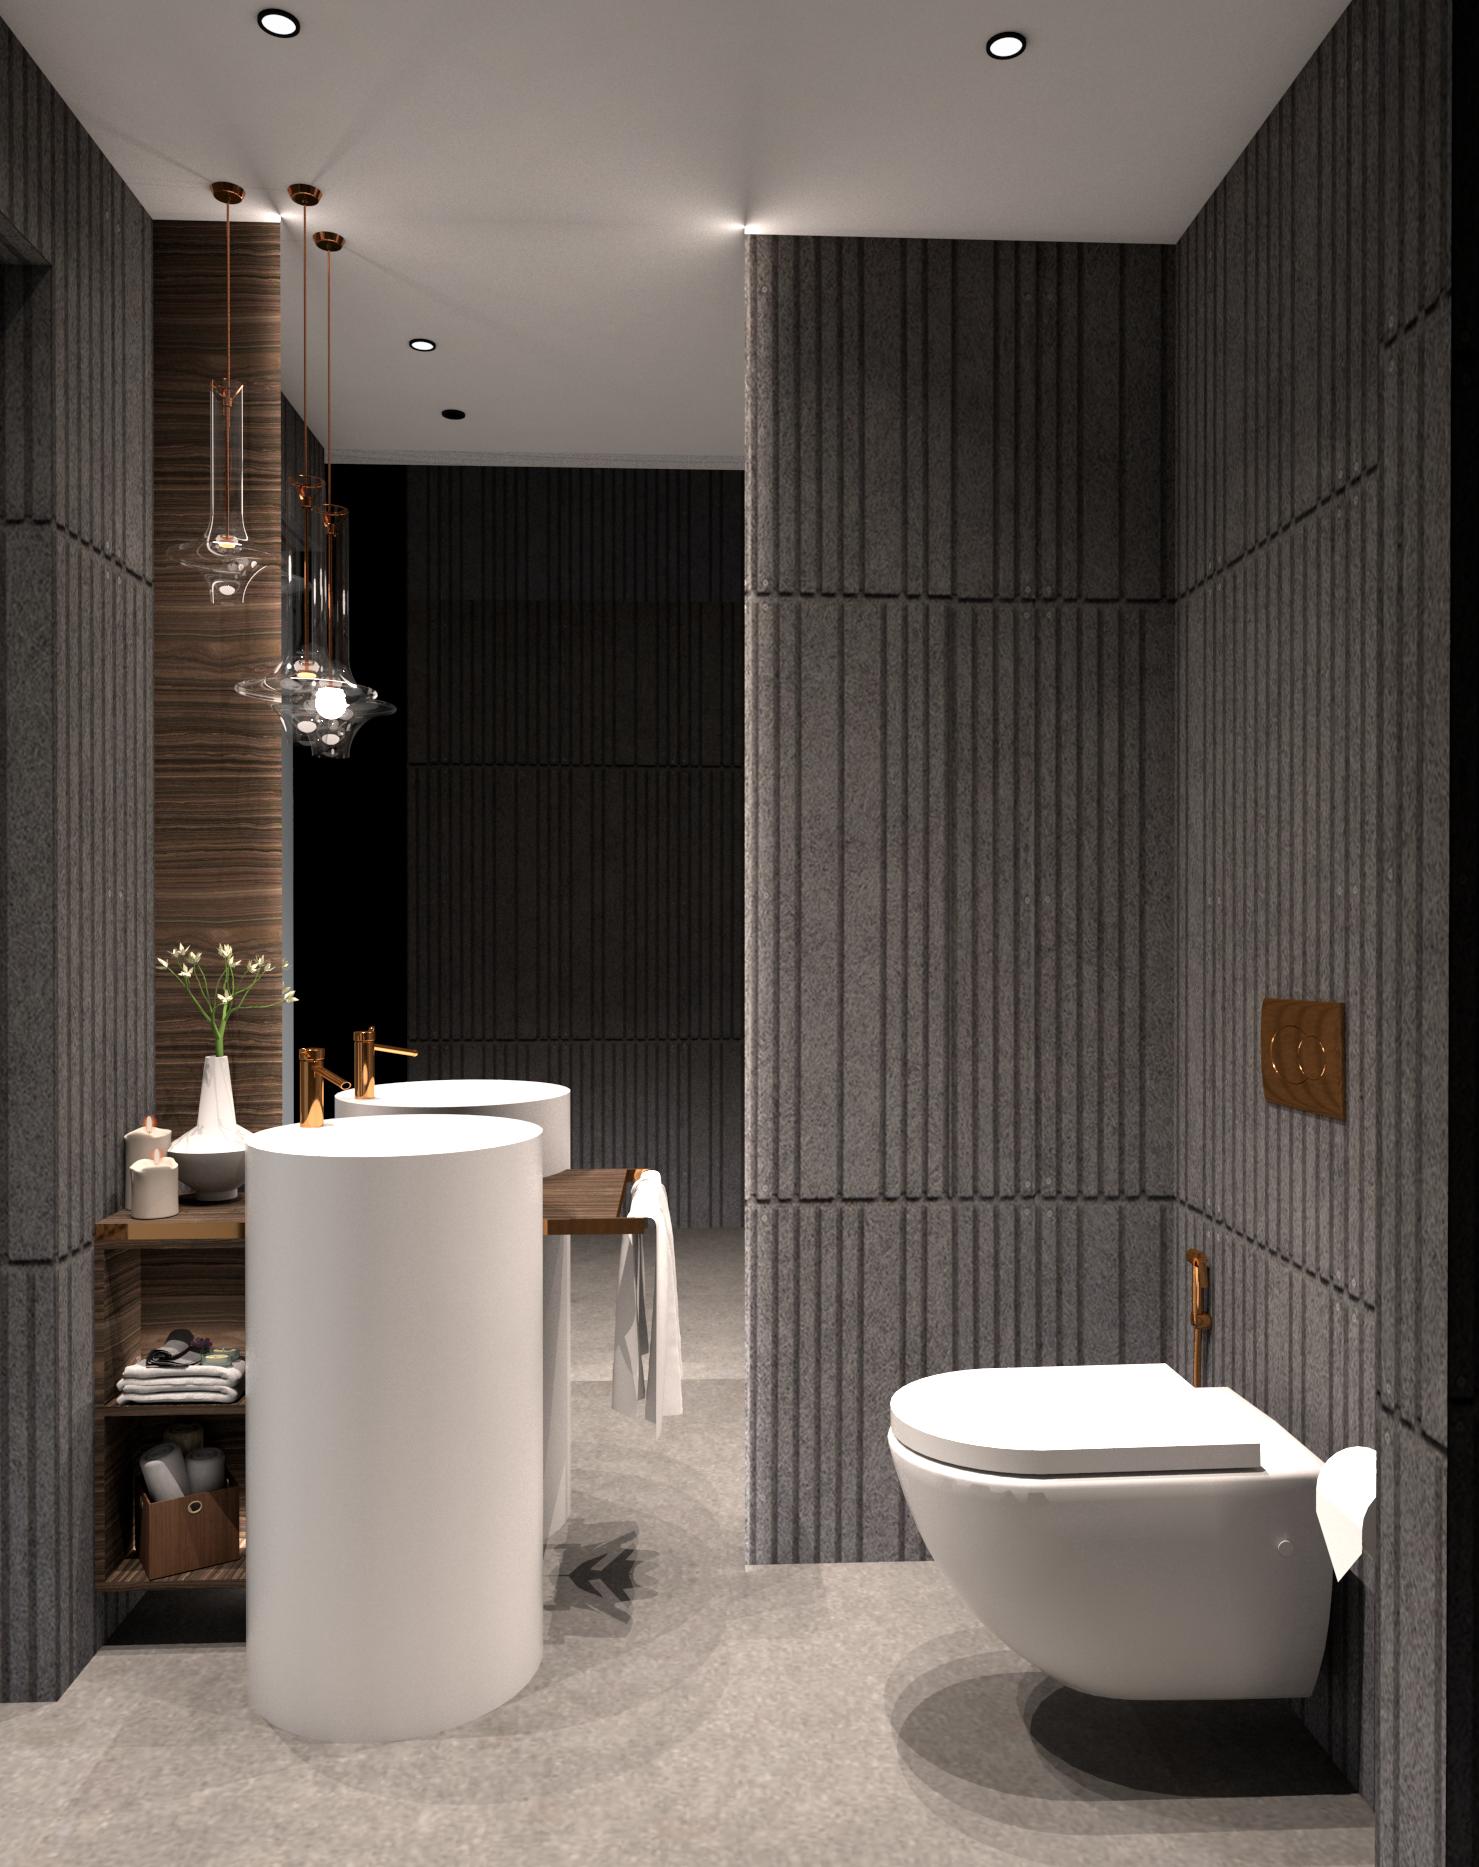 Powder Bathroom 1 (View 2)